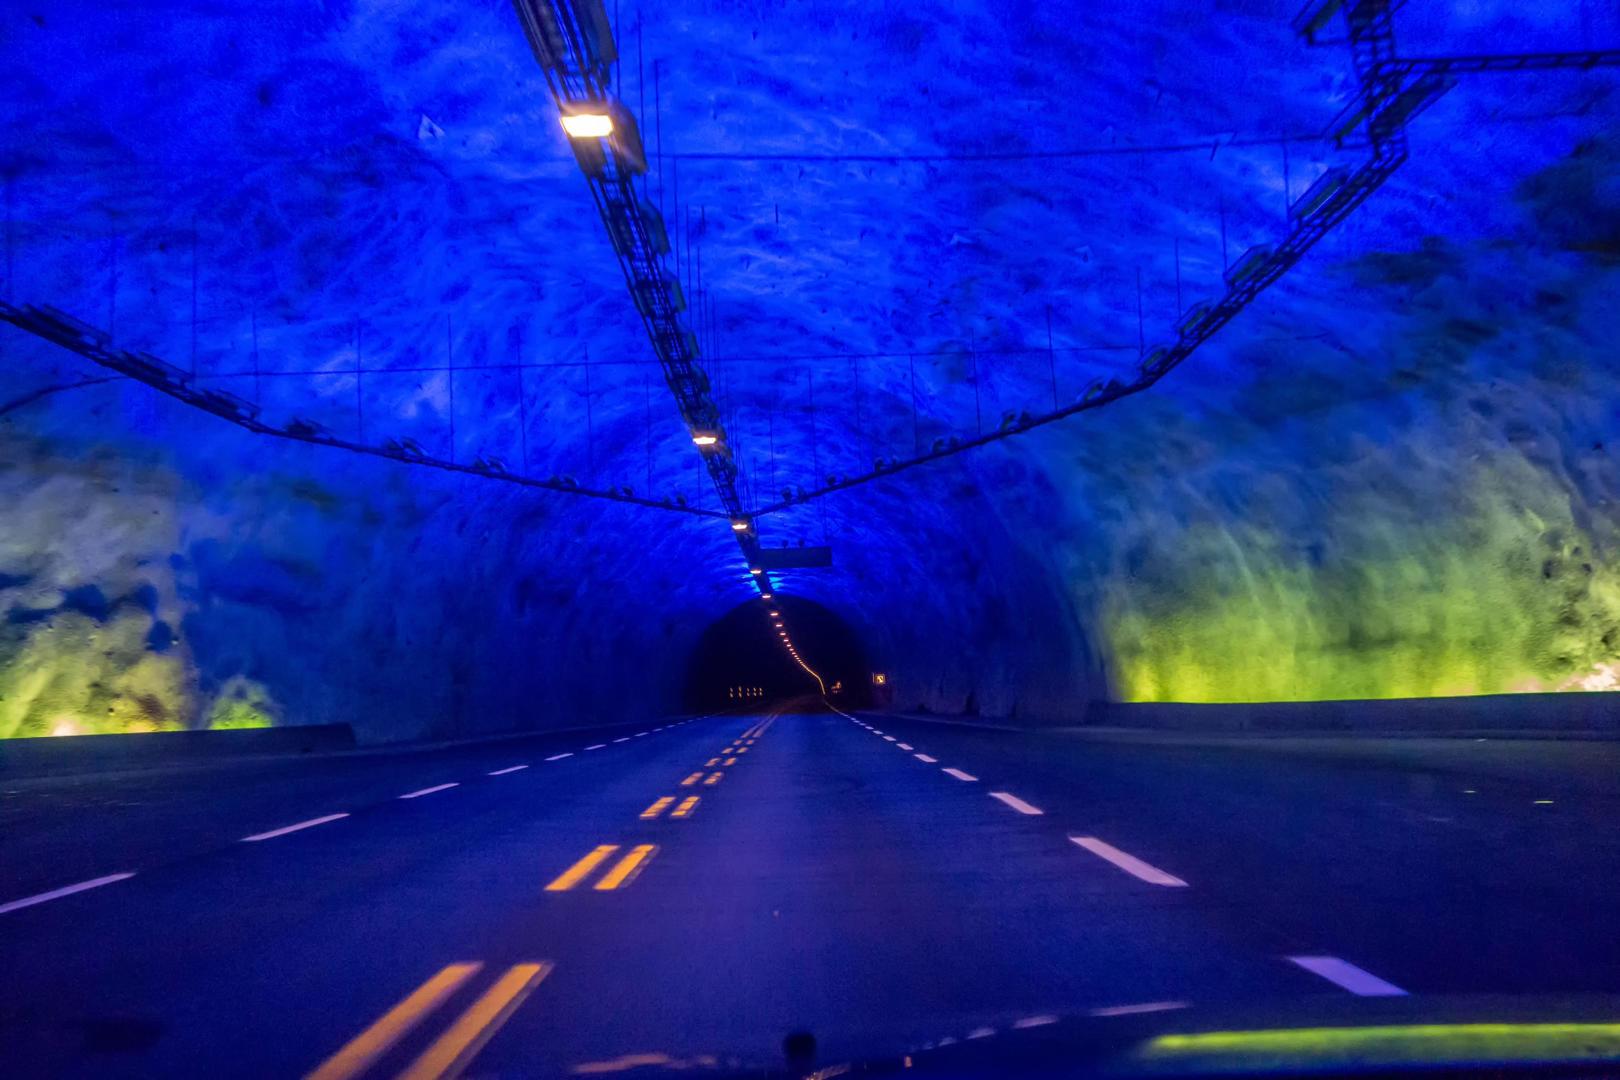 Terowongan Laerdalstunnelen, Norwegia (24,5 km)